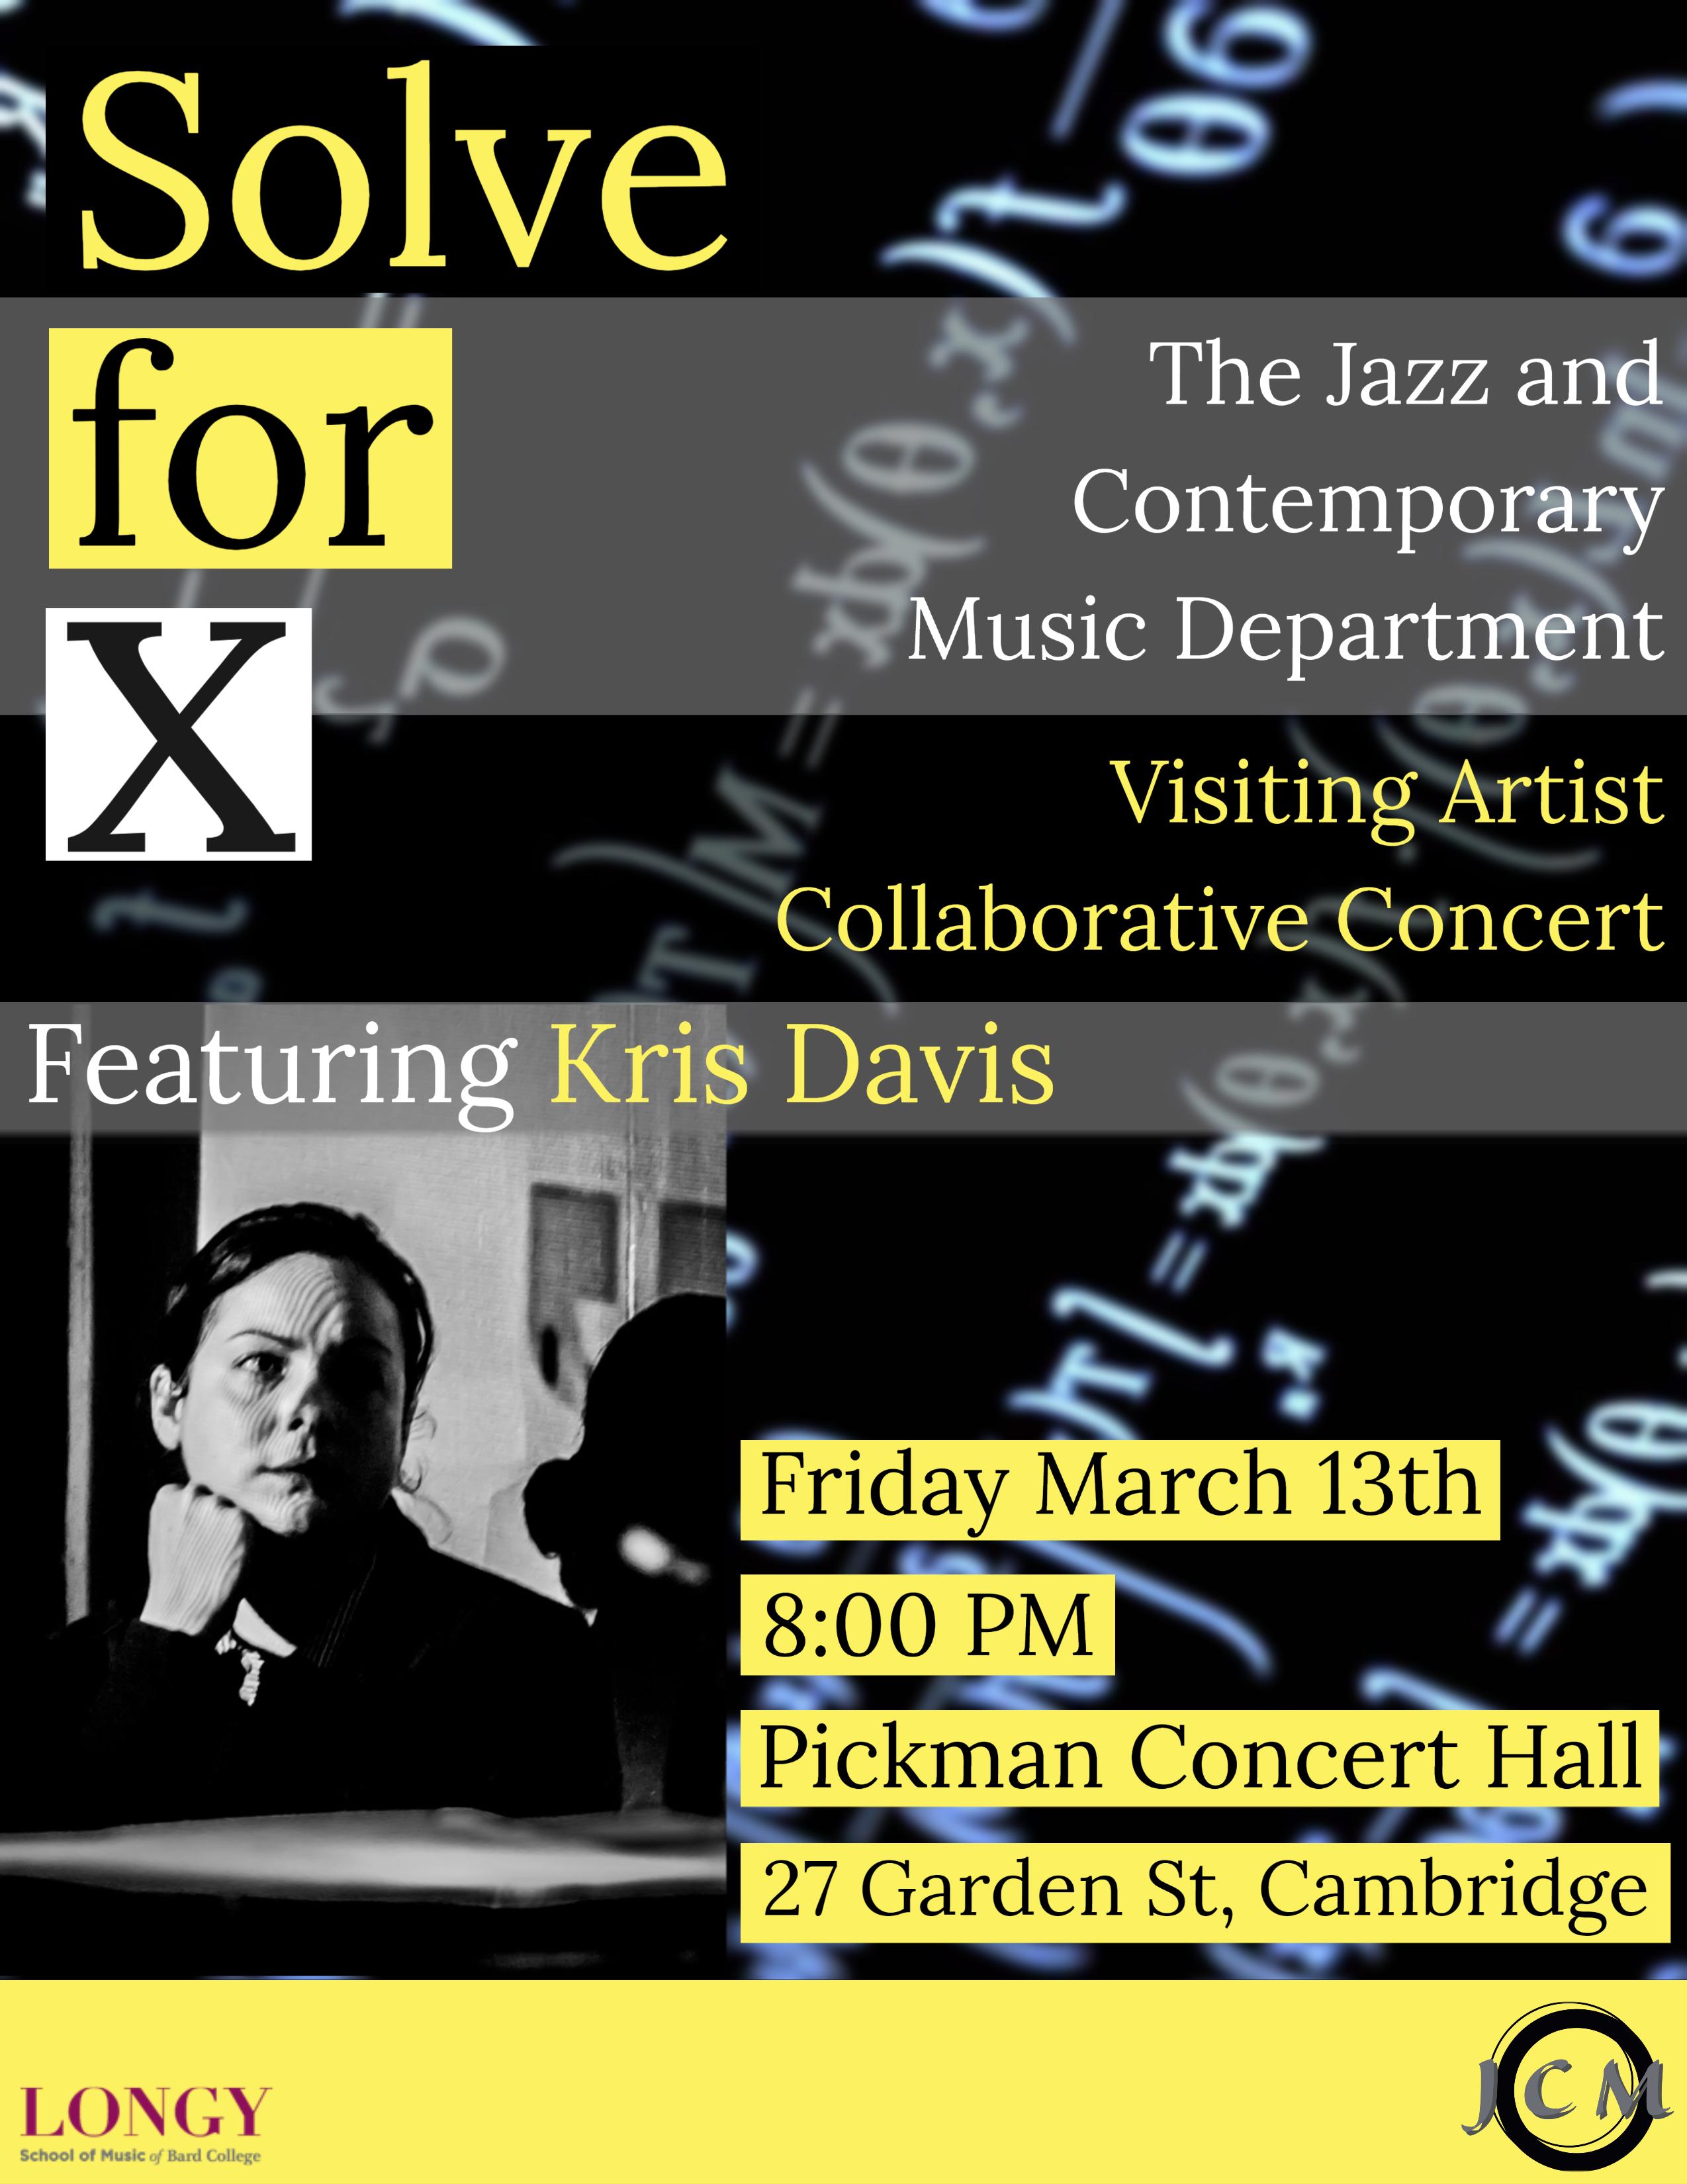 Kris Davis & The Jcm Dept. At Longy